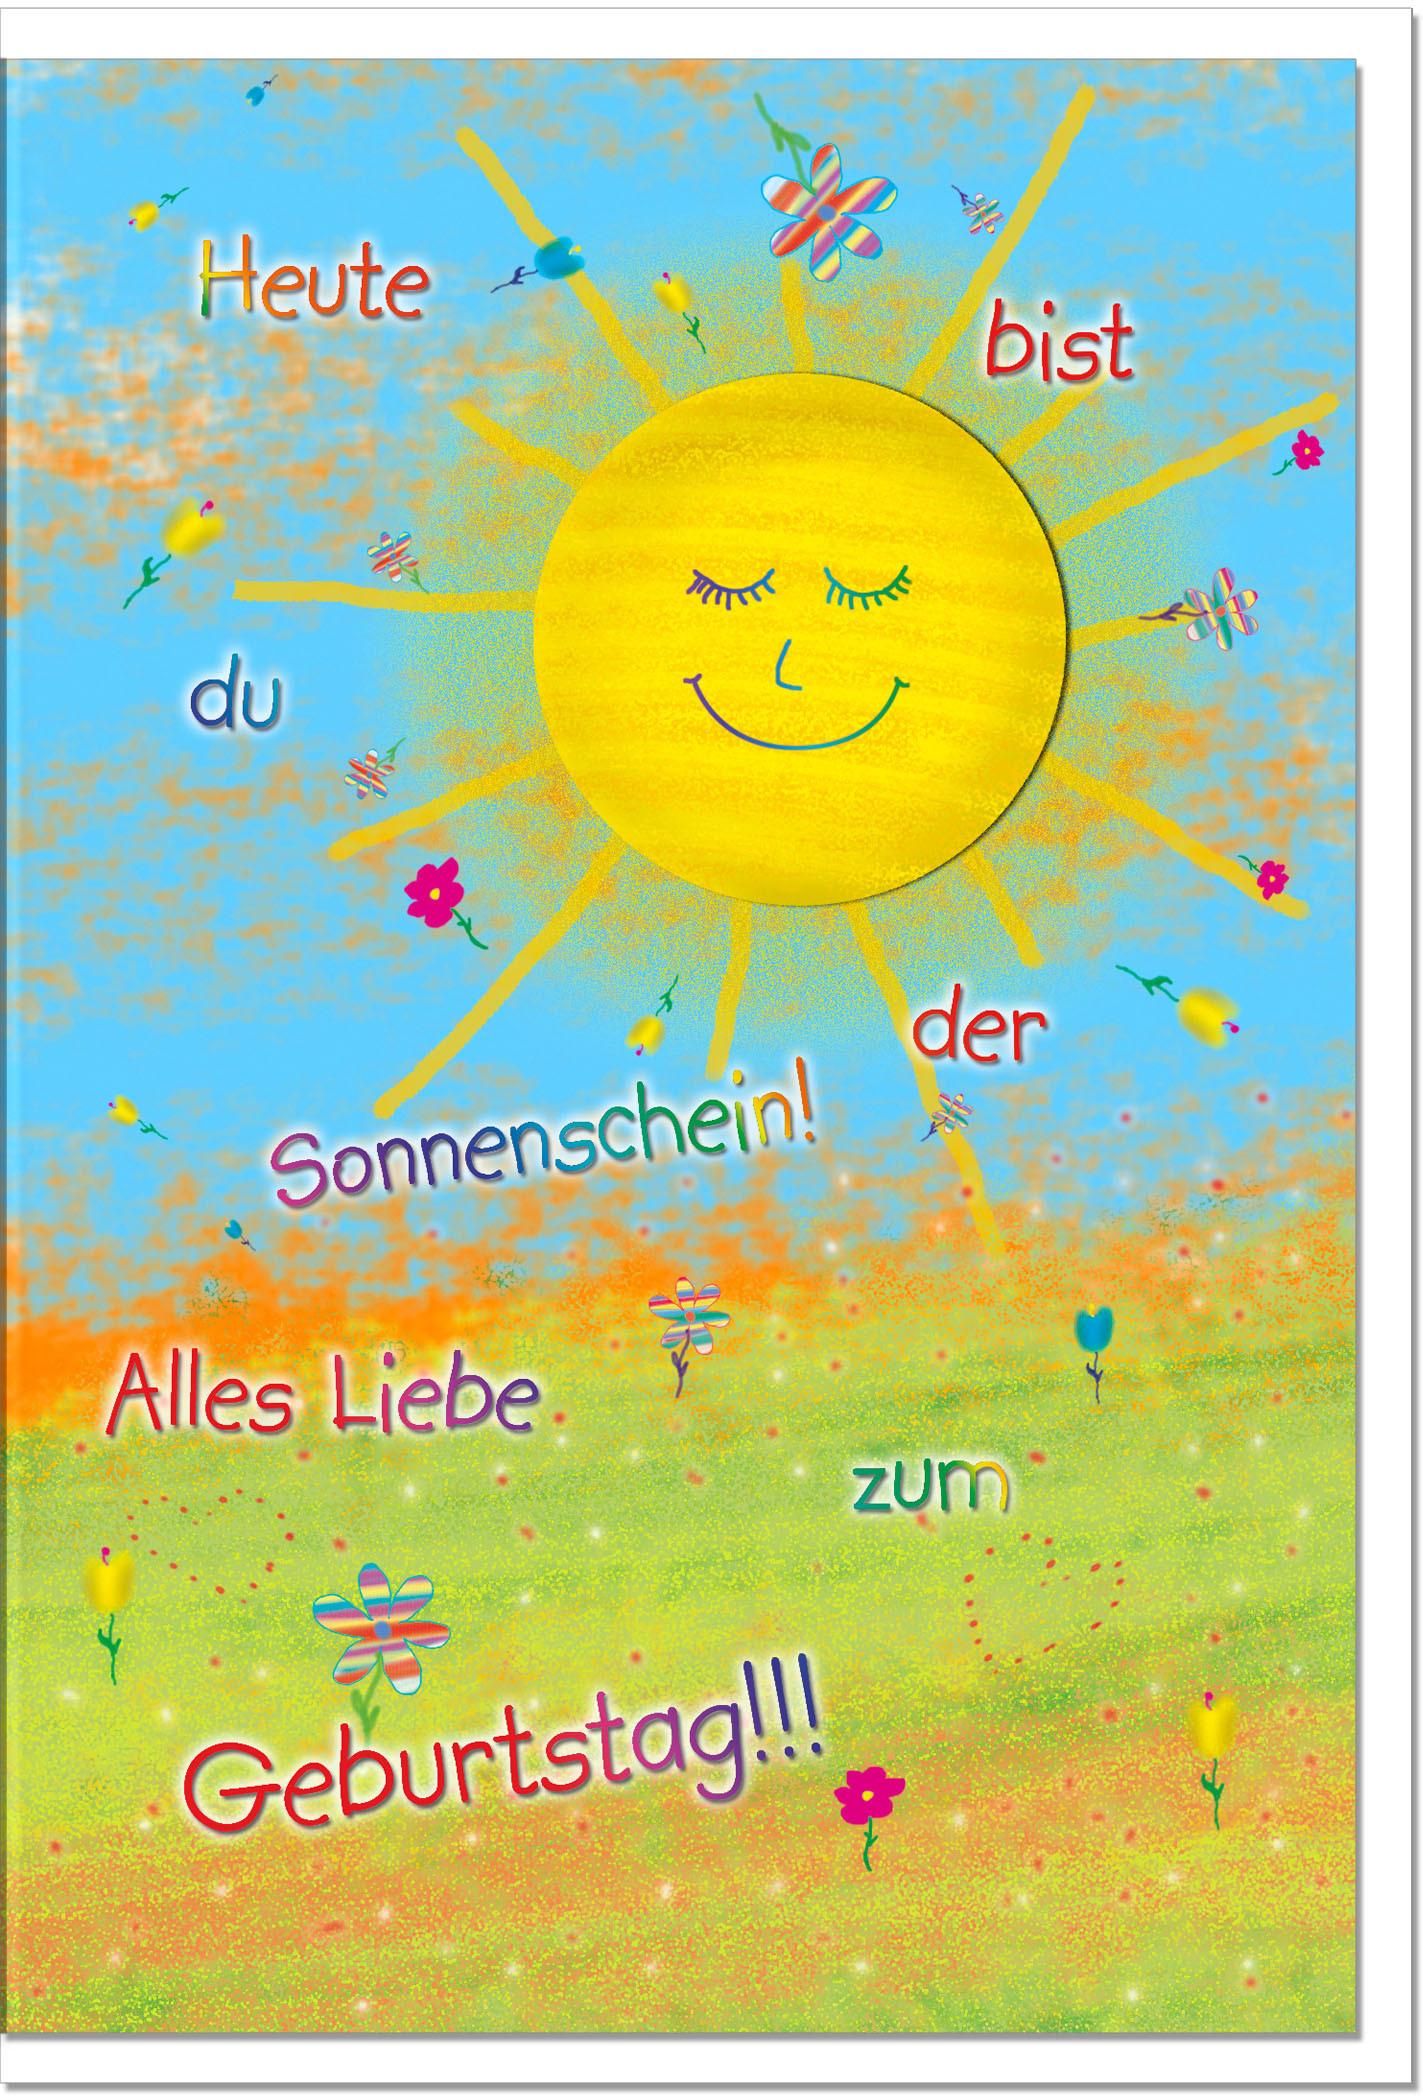 Bilder Geburtstagskarten  Geburtstagskarten Grußkarten Geburtstag Sonne